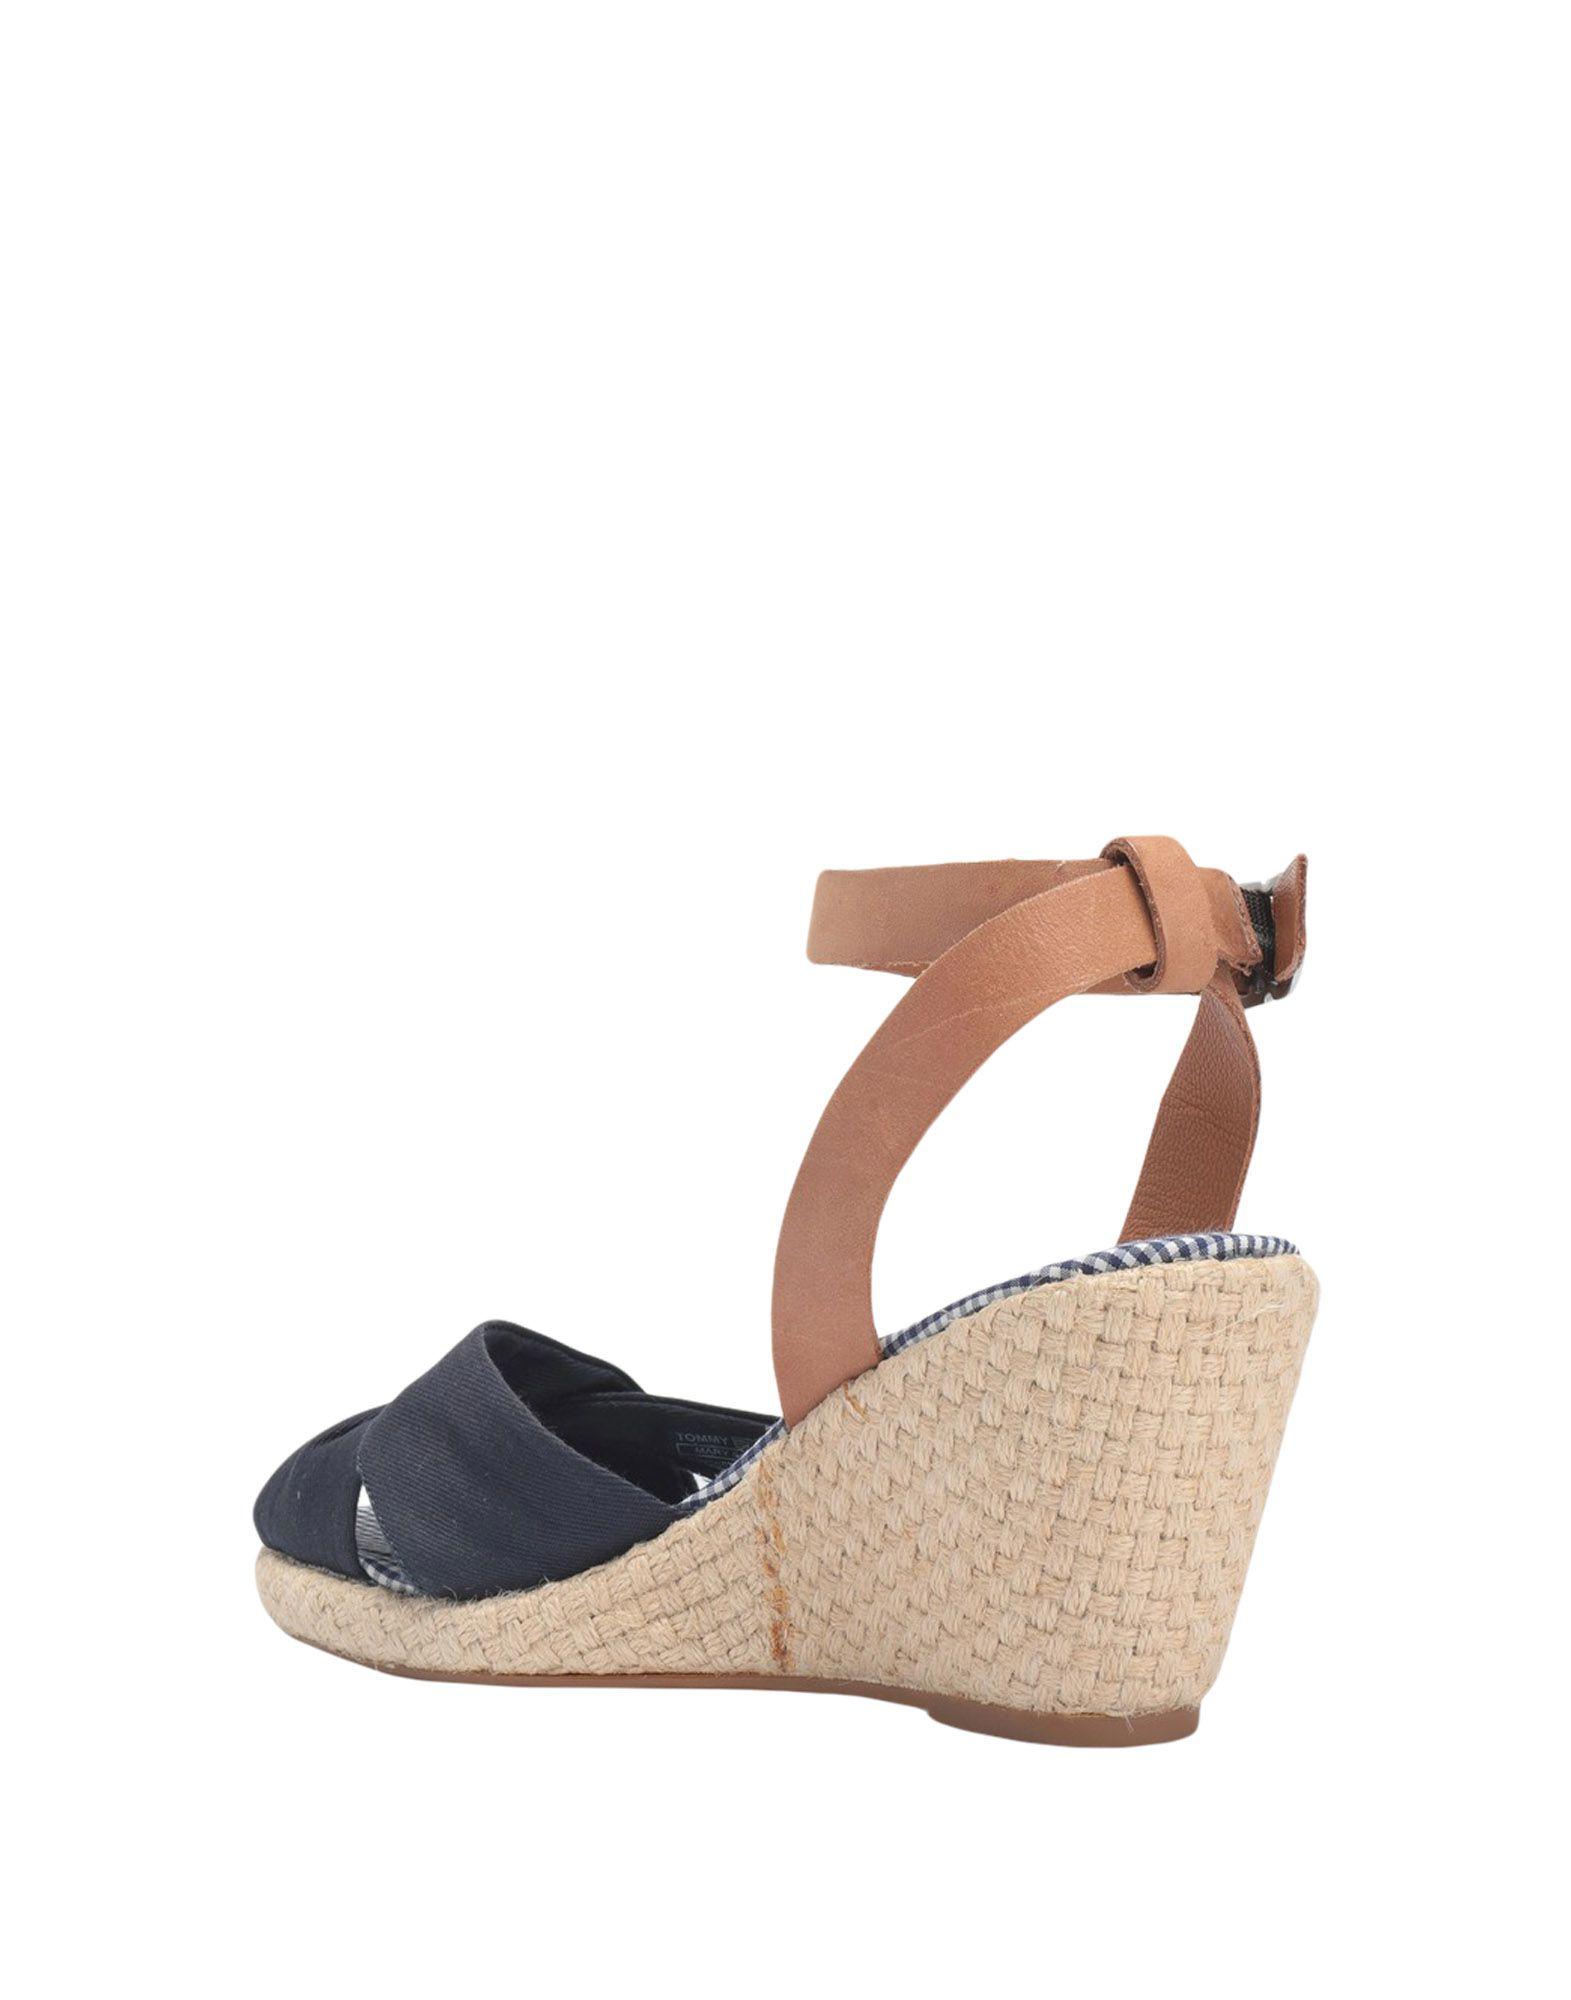 Tommy Hilfiger Sandalen Damen  11527624UA 11527624UA  Neue Schuhe 3008f4